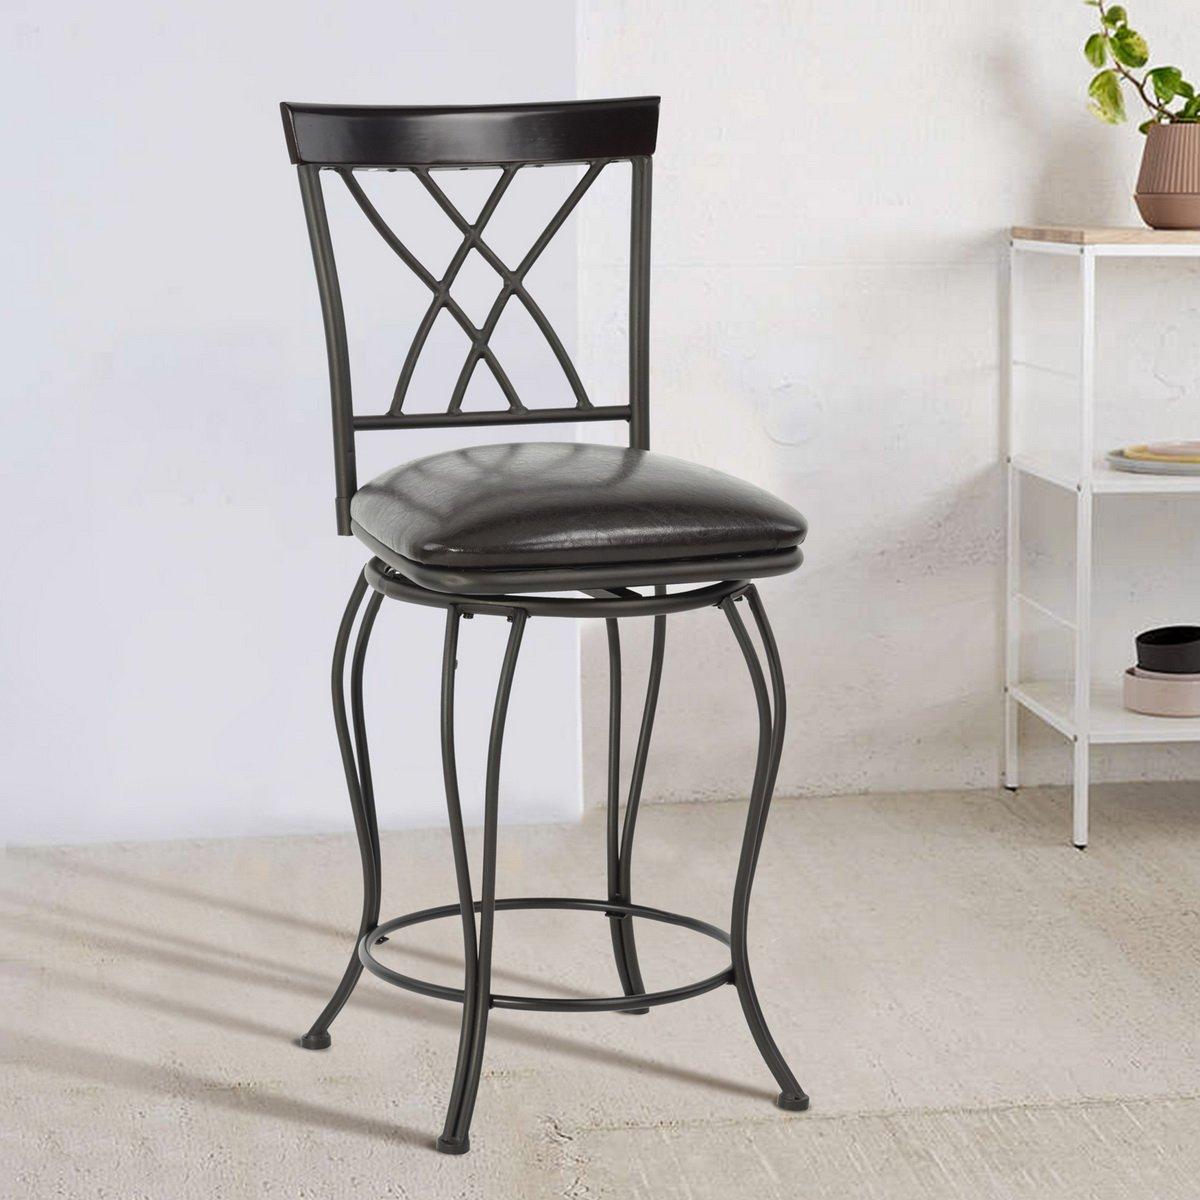 FurnitureR 24'' Circles-Back Swivel Bar stool Counter Height Bar Chair by FurnitureR (Image #2)